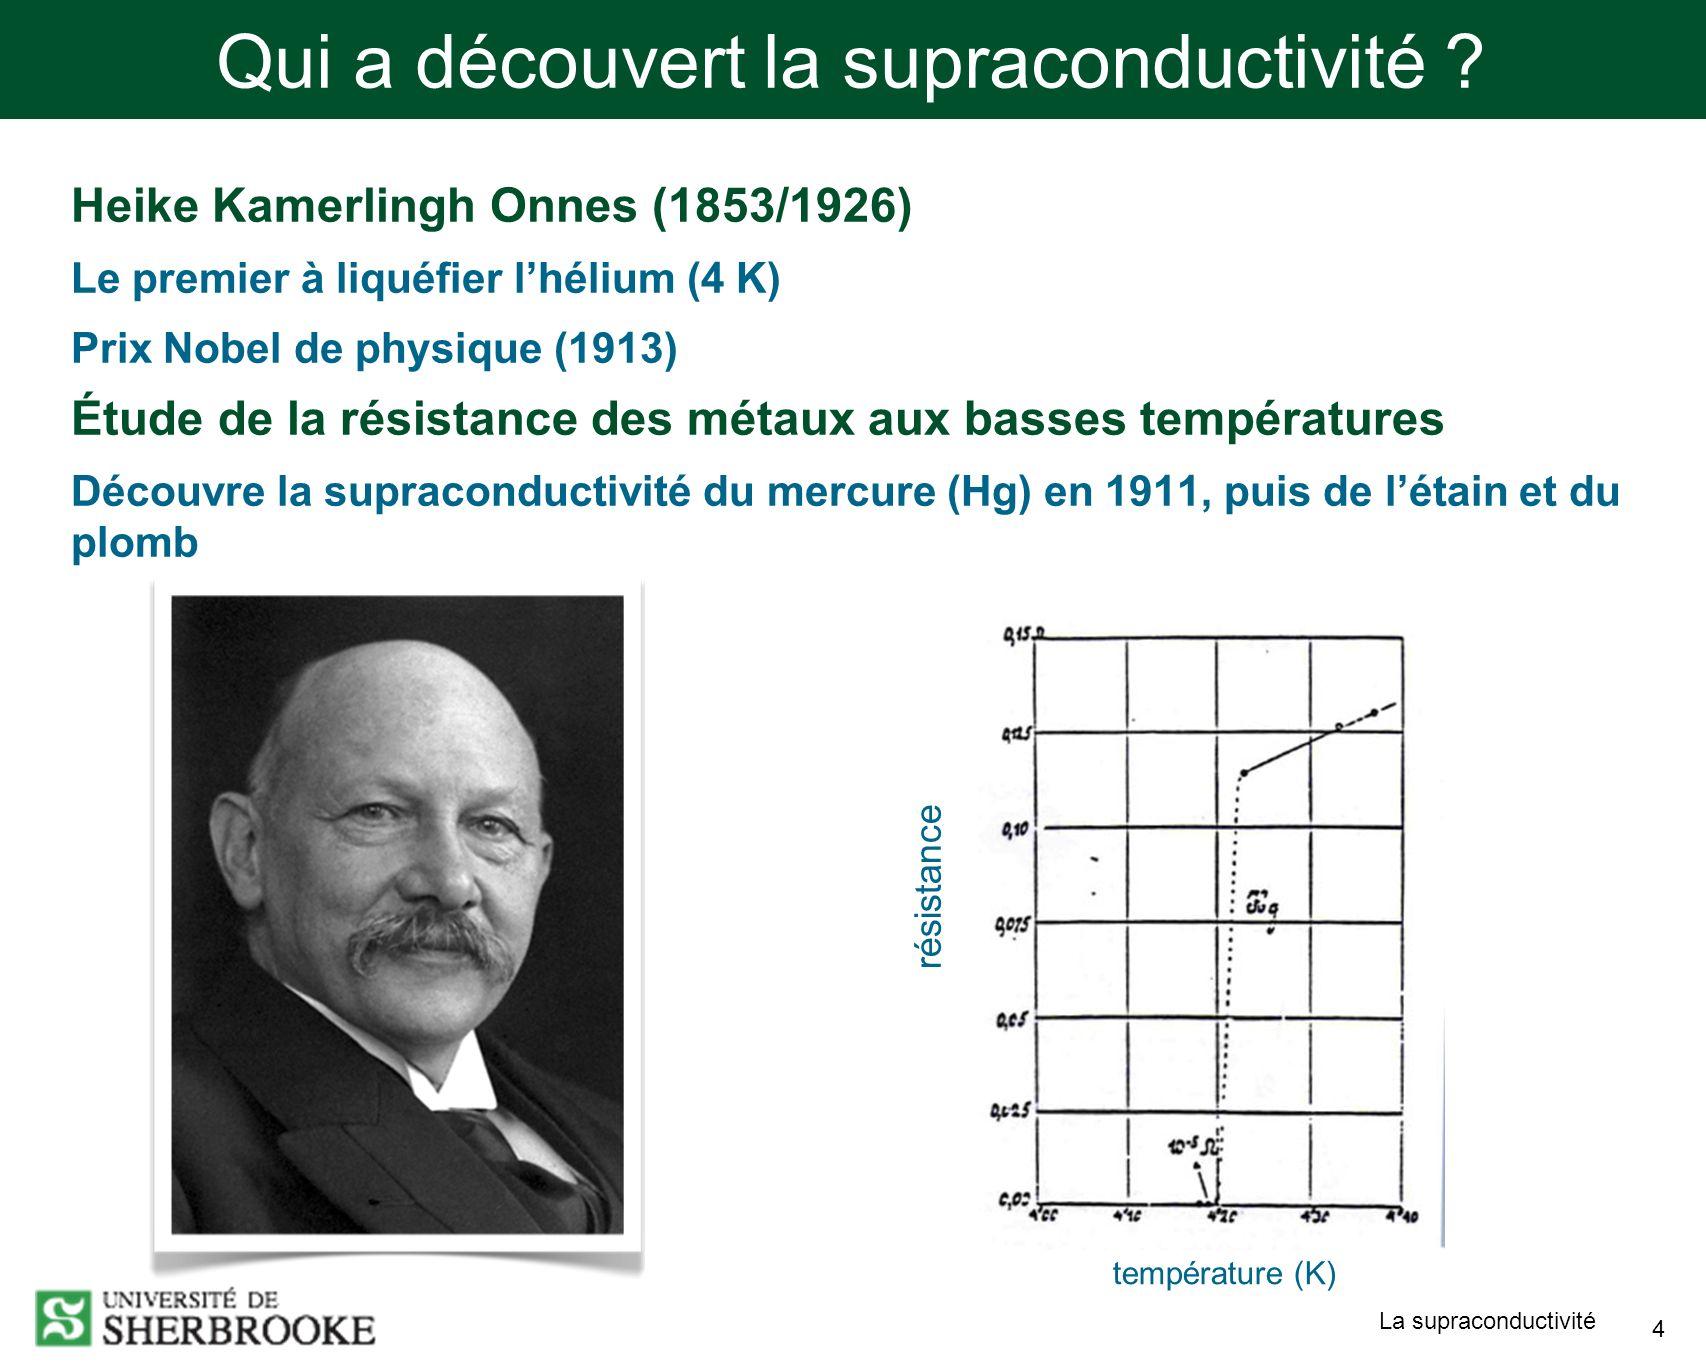 La supraconductivité 5 La course vers le froid 273.15 K = 0C James Dewar (1898) Hydrogène 20.3 K Heike Kamerlingh Onnes (1908) Hélium 4.2 K Azote 77 K Oxygène 90.2 K Eau 373.15 K Karol Olszewski & Zigmunt Wróblewski (1883) zéro absolu -273.15 C